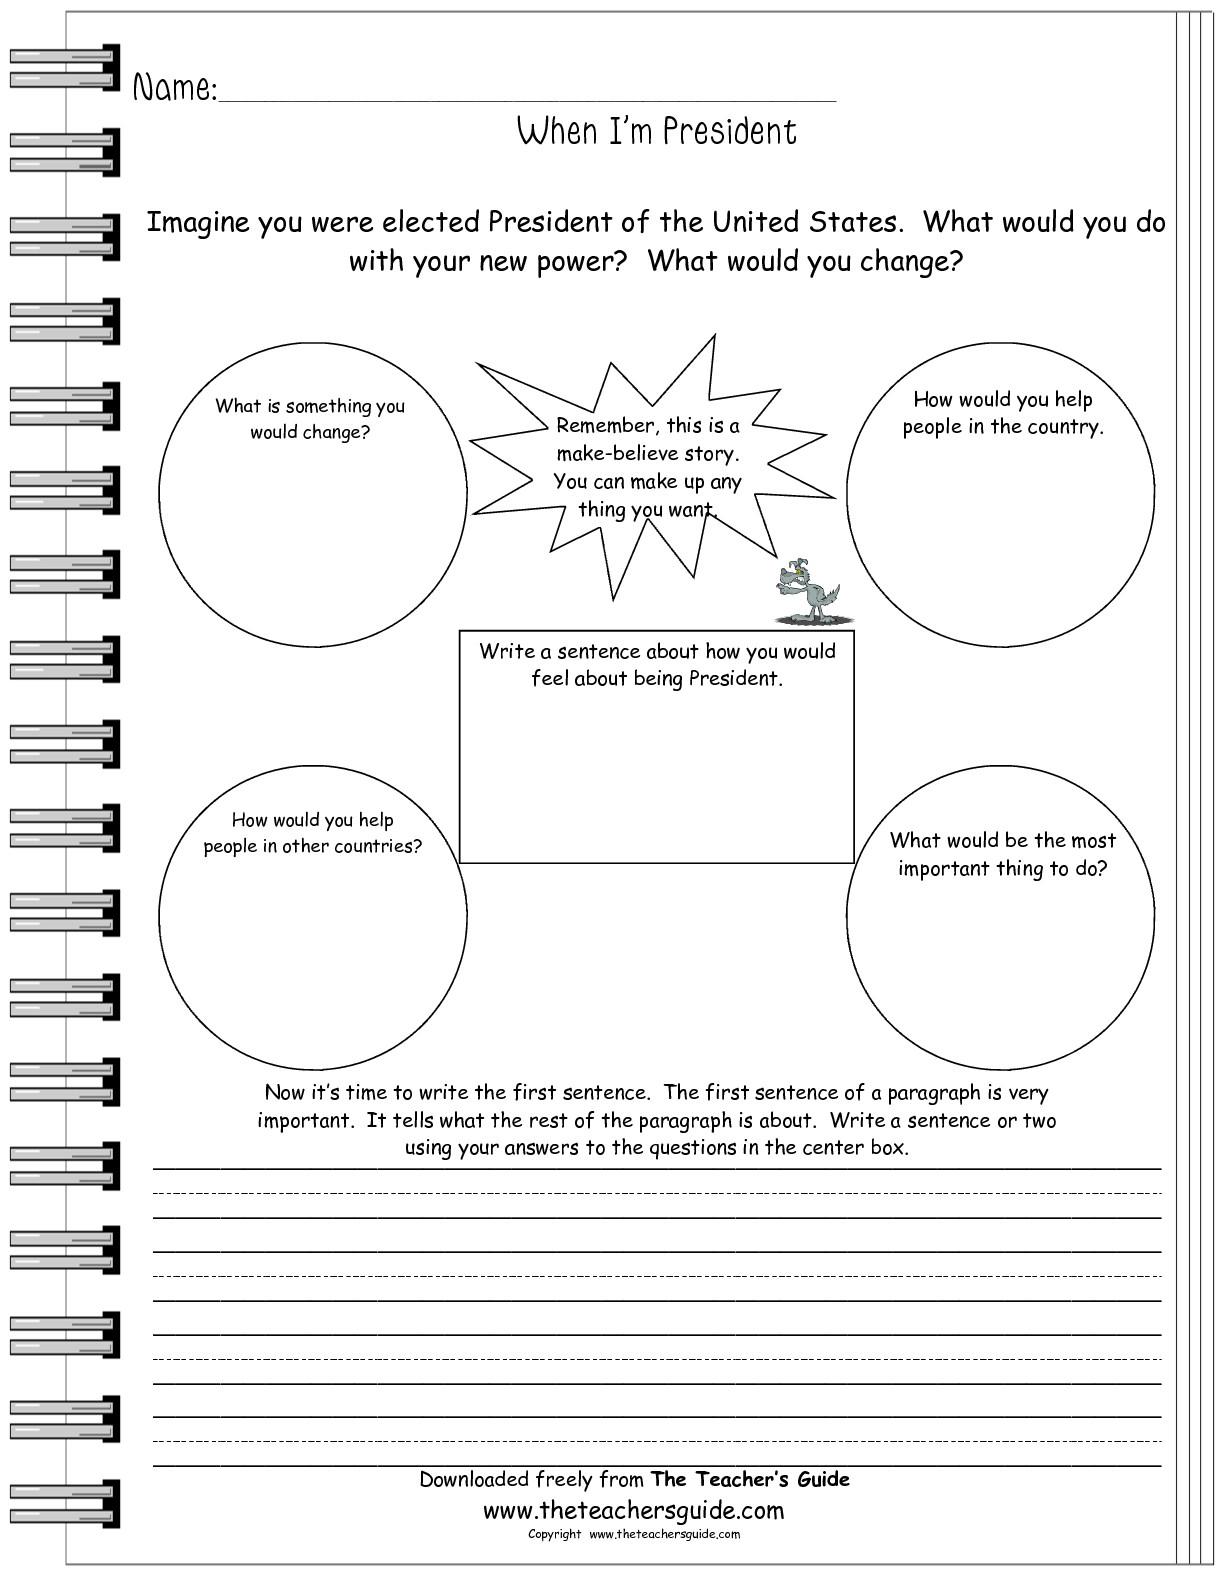 If I Were President Printable Worksheet